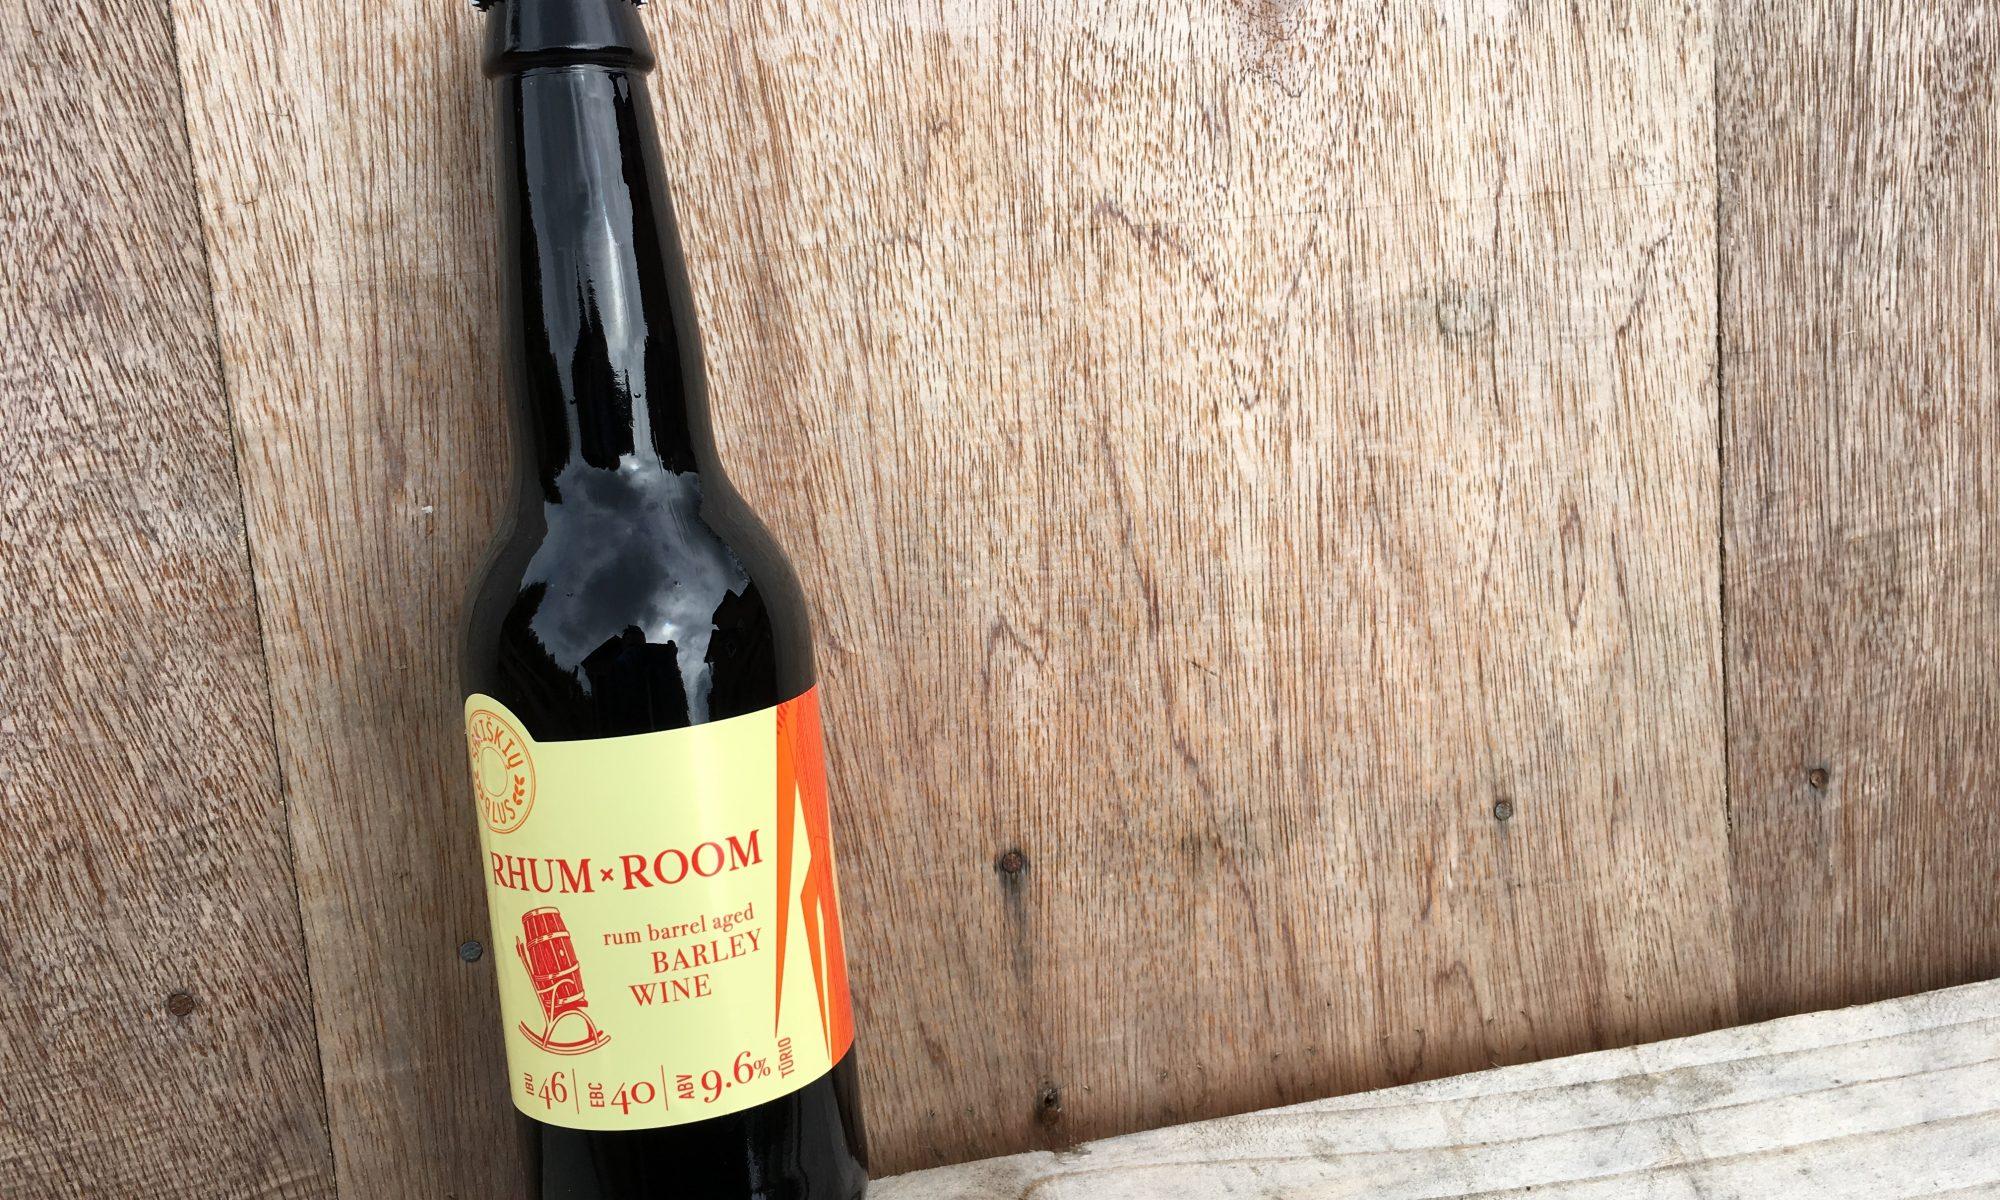 modernus-lietuviskas-alus-sakiskiu-barley-wine-rum-barrel-aged-vynas-mieziu-rhum-room